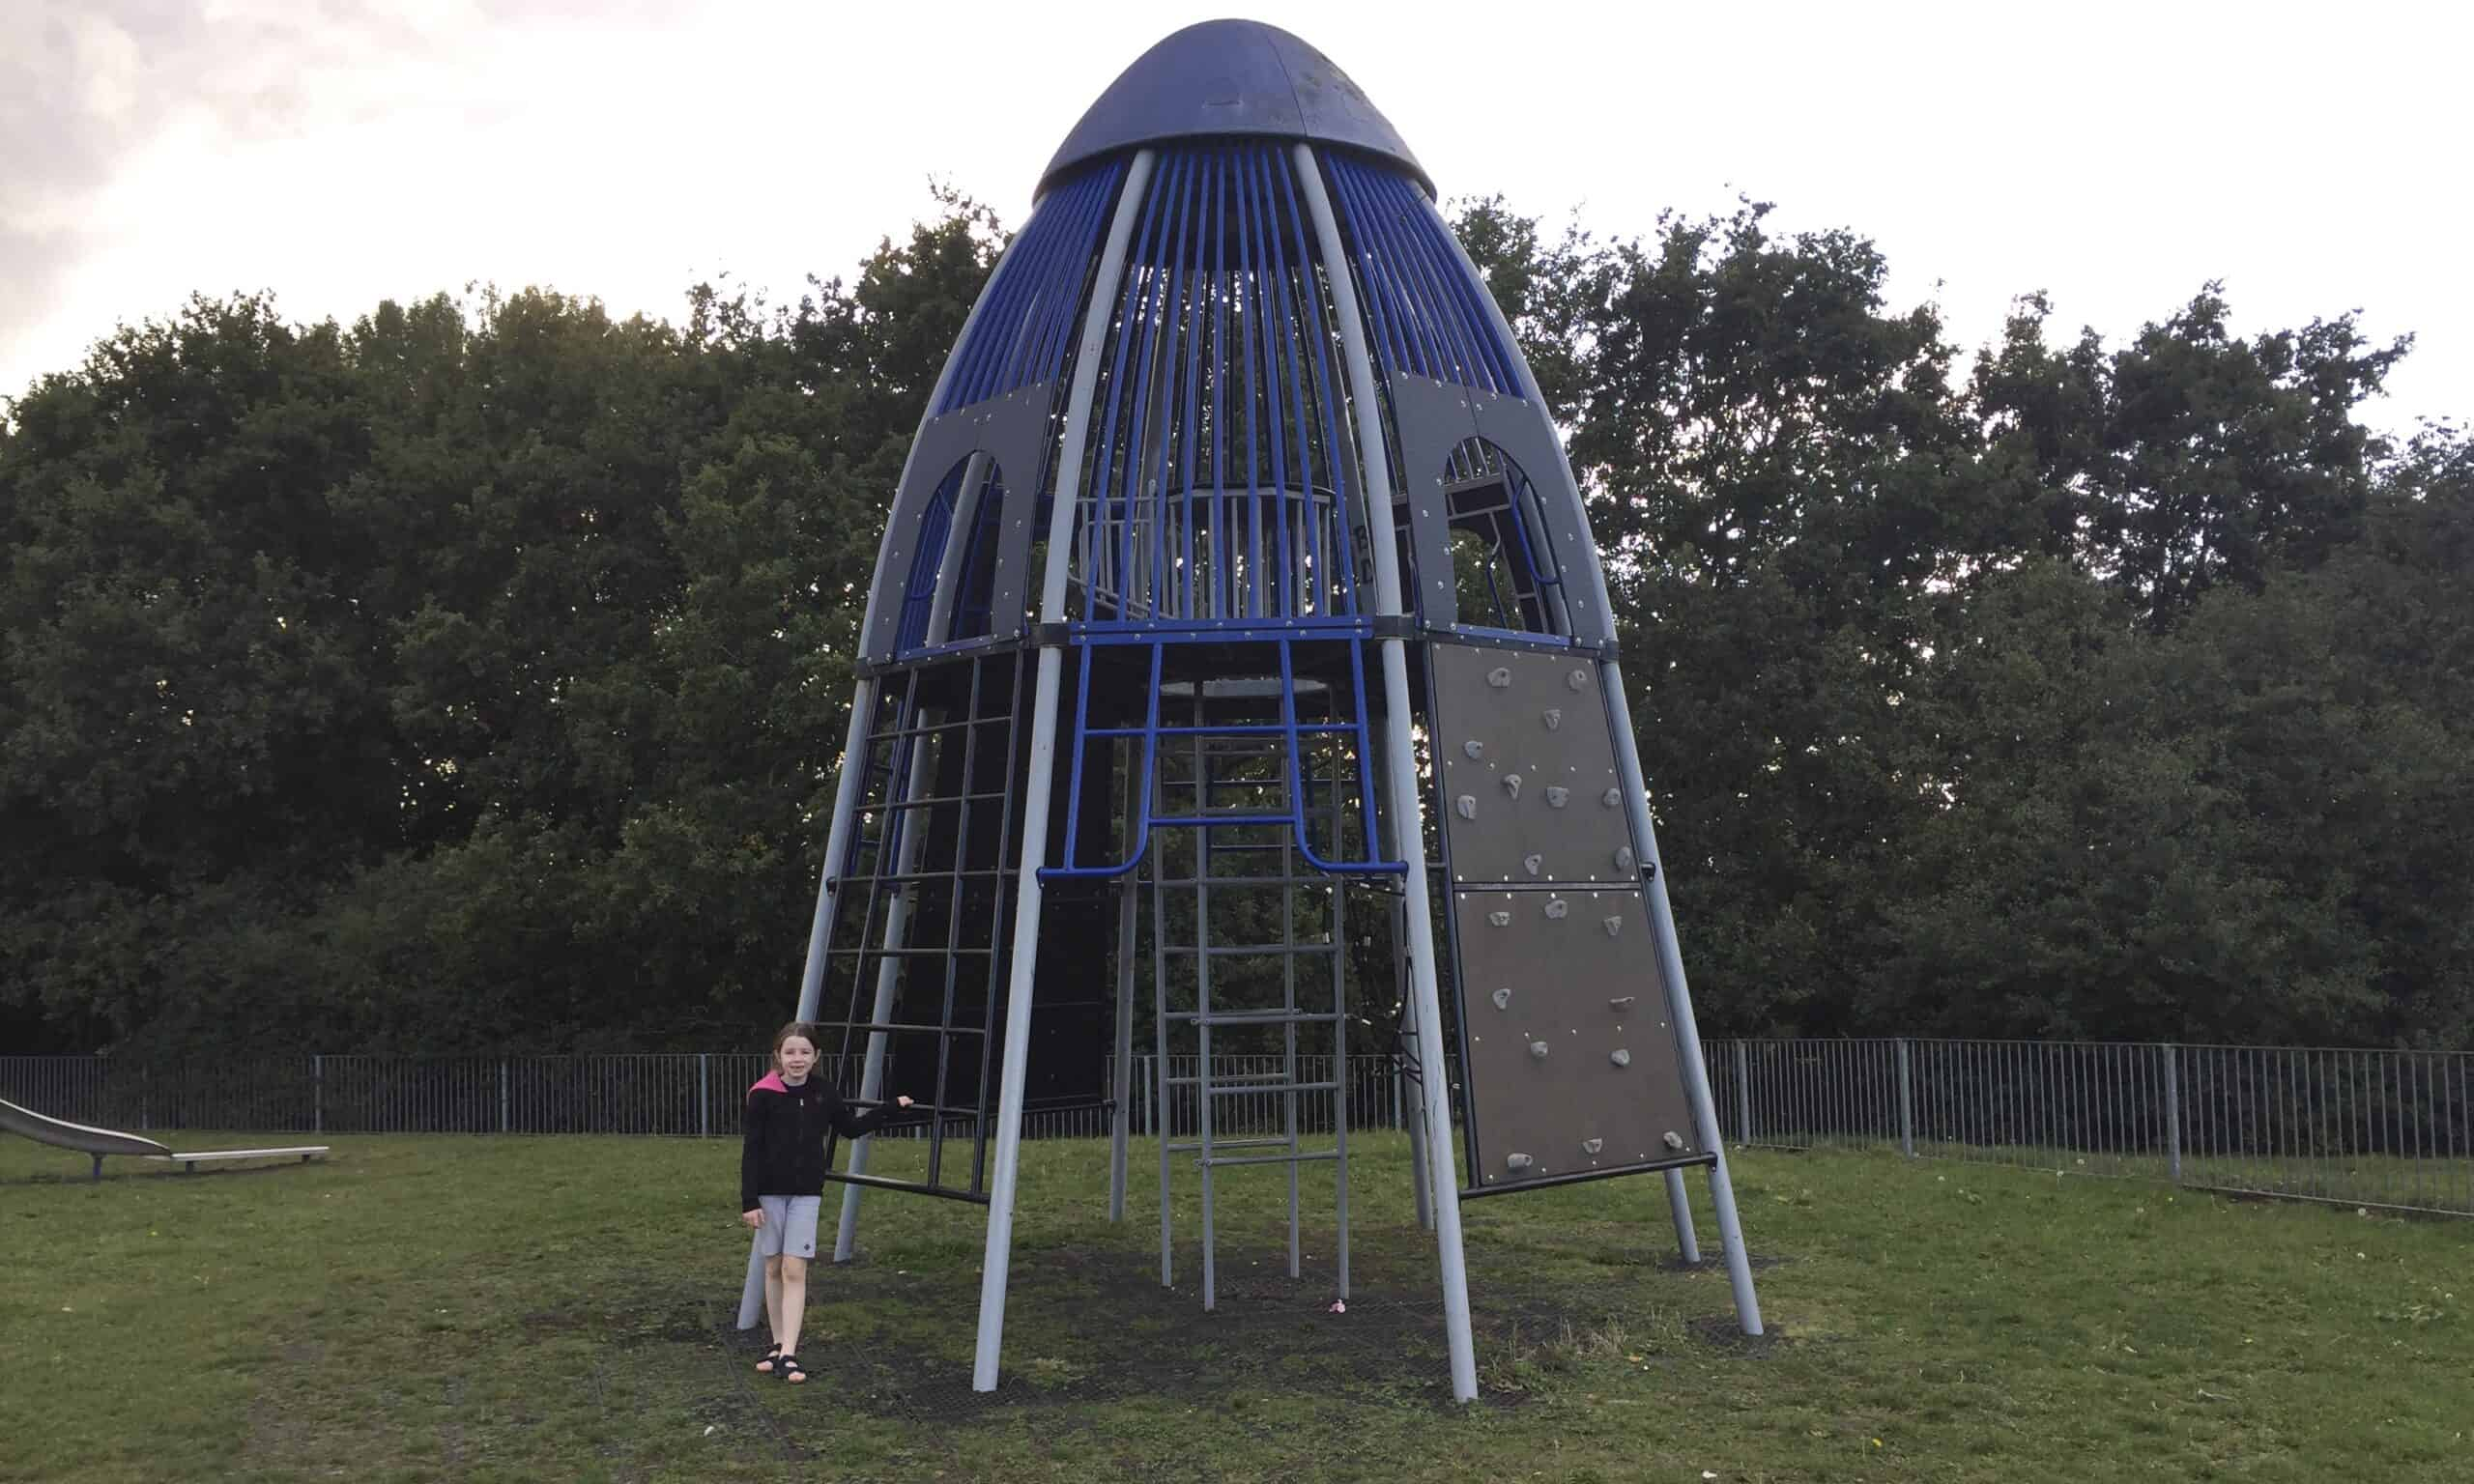 The climbing frame at Springfield Hall Park